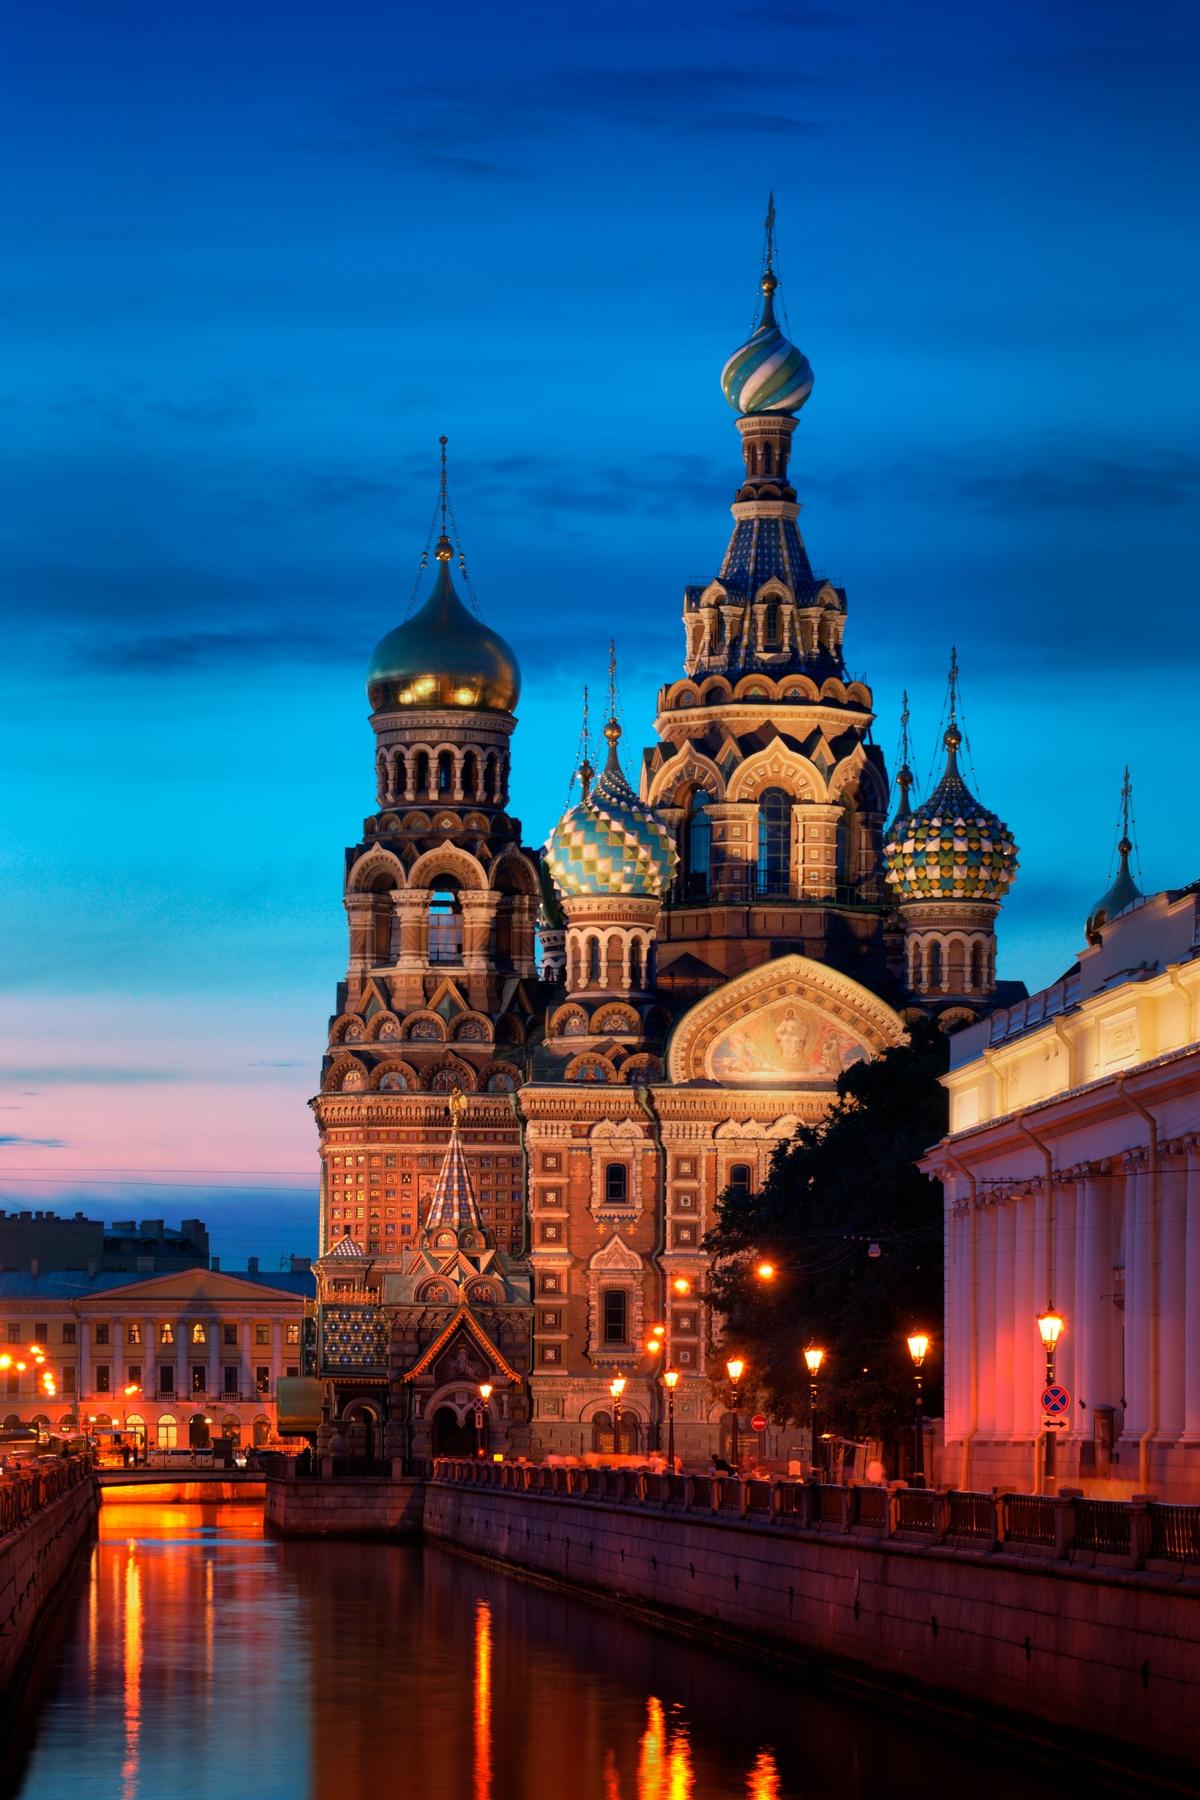 O Nαός του Χυμένου Αίματος, απ' τα τοπ αξιοθέατα στην Αγία Πετρούπολη - ταξίδια σε πόλεις της Ευρώπης